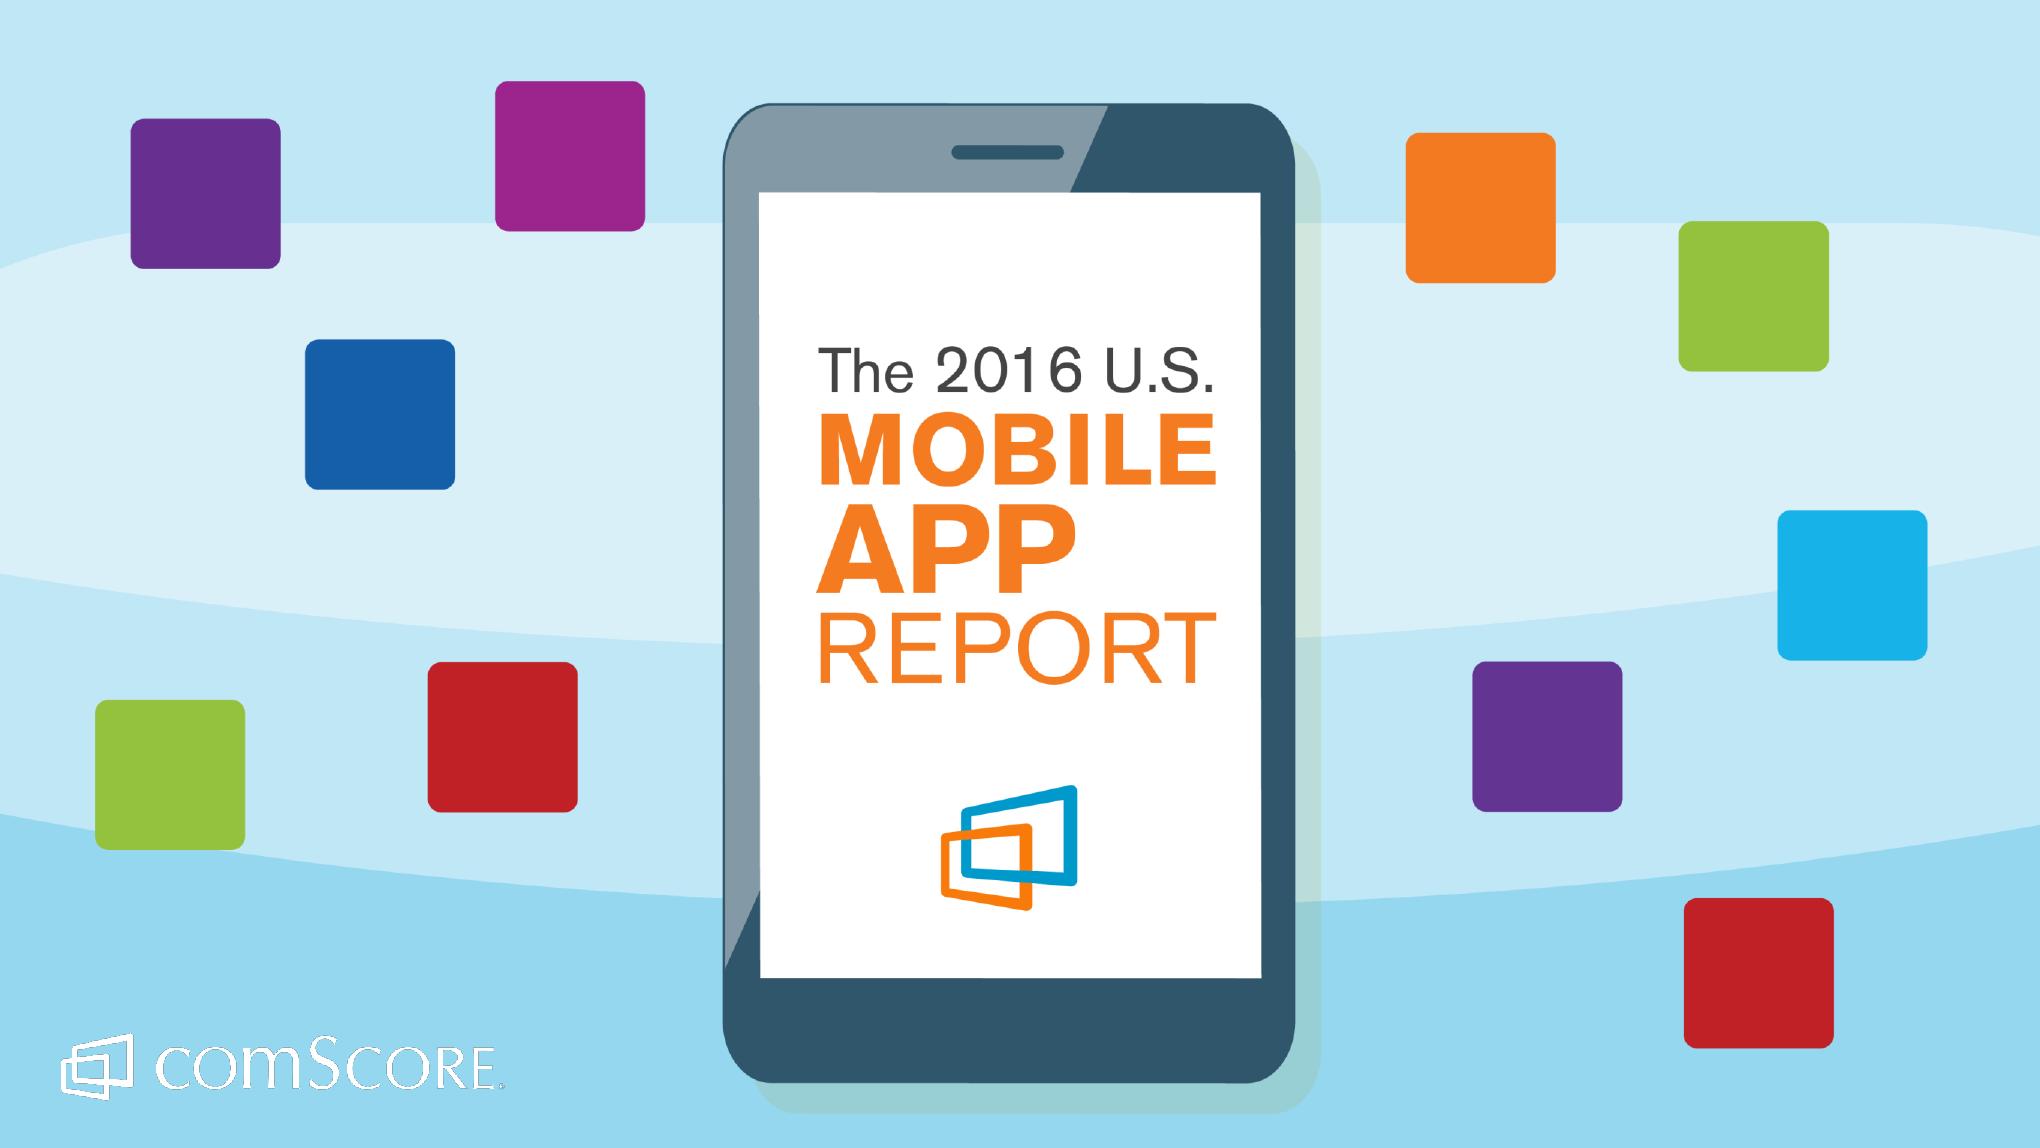 2016_US_Mobile_App_Report_000001